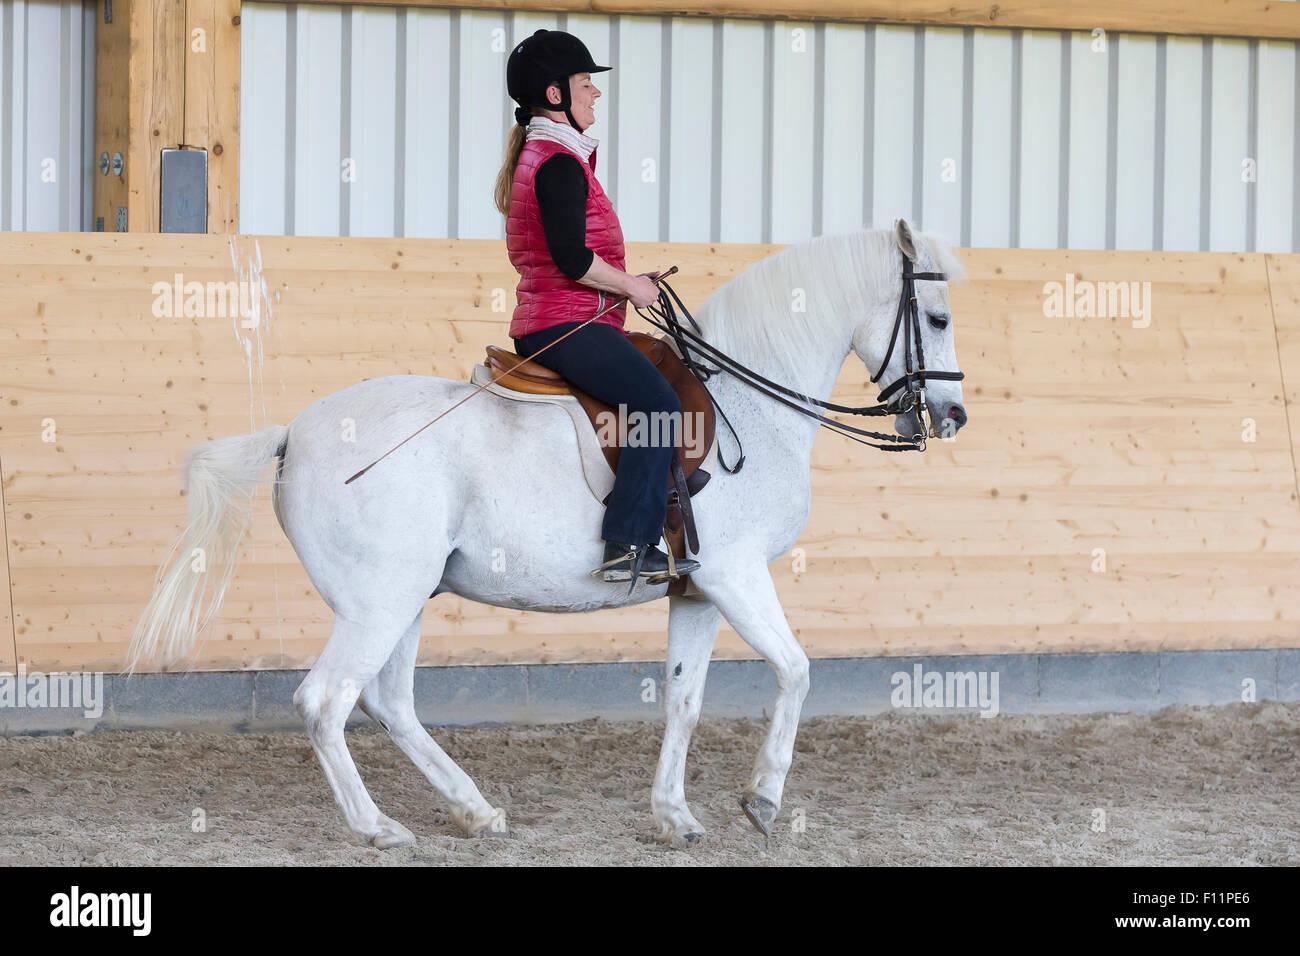 German Riding Pony Rider white pony performing piaffe - Stock Image